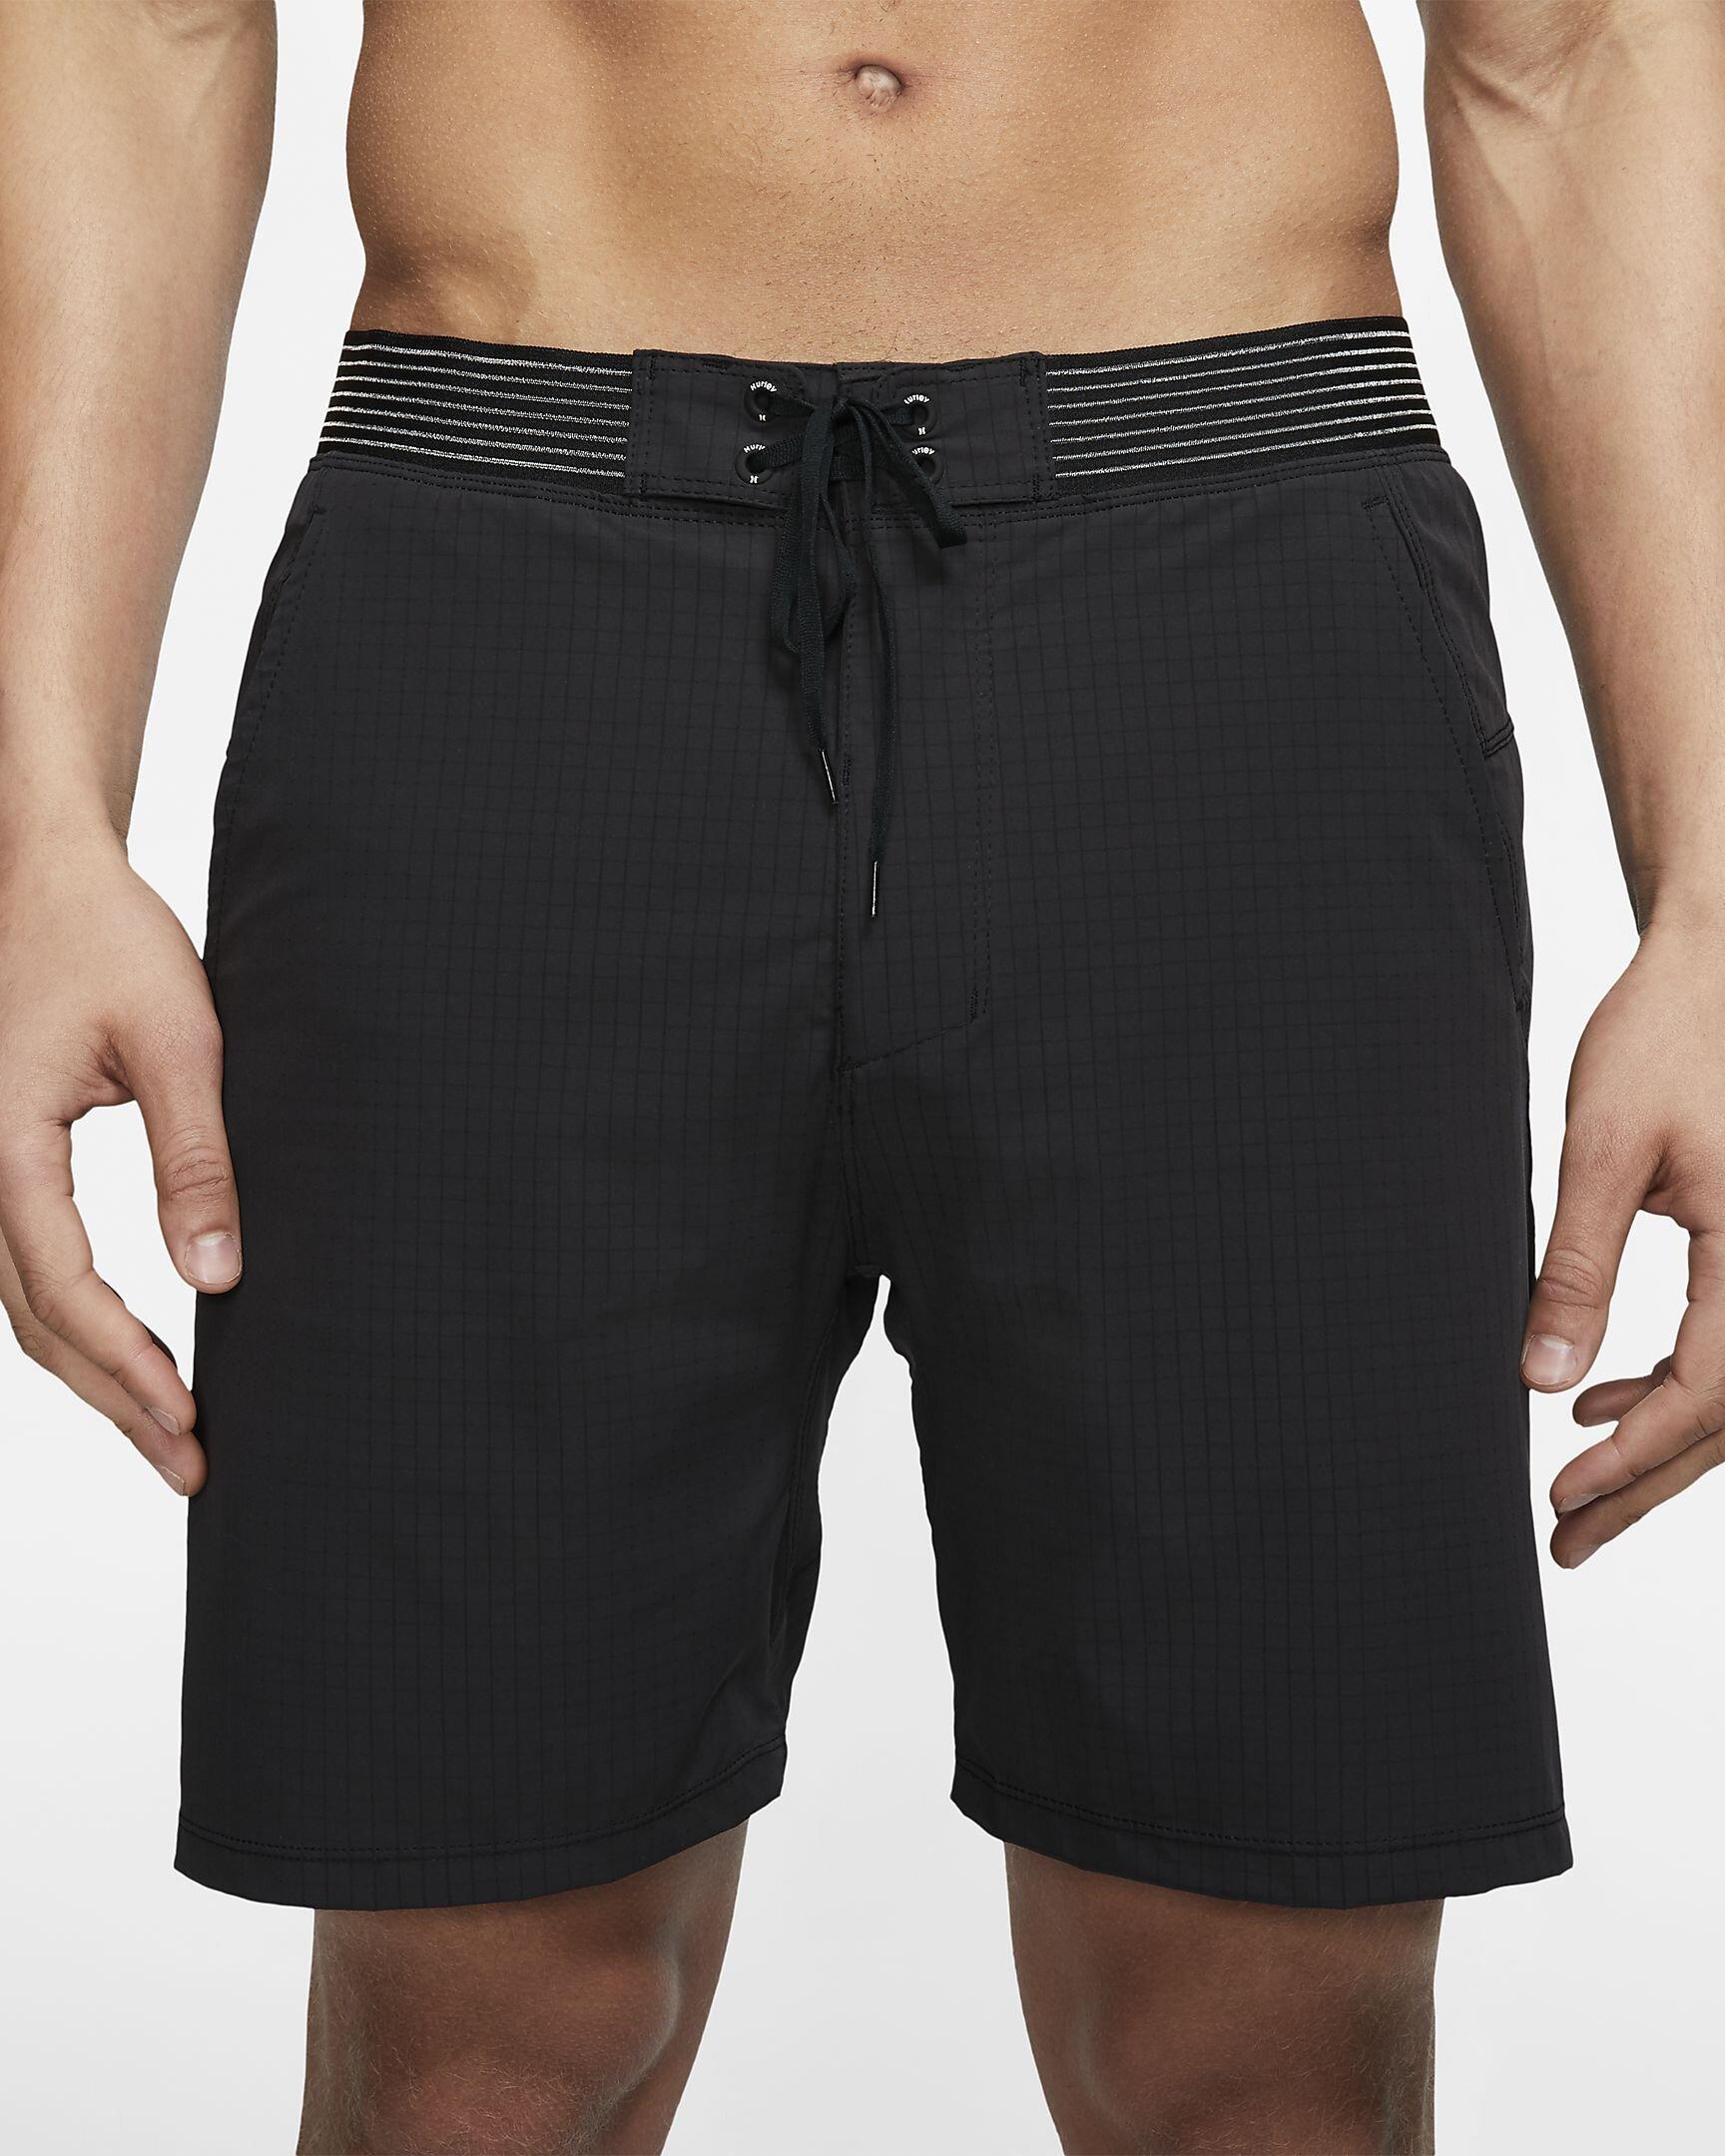 hurley-phantom-alpha-trainer-plus-mens-18-2-in-1-shorts-hncslX.jpg